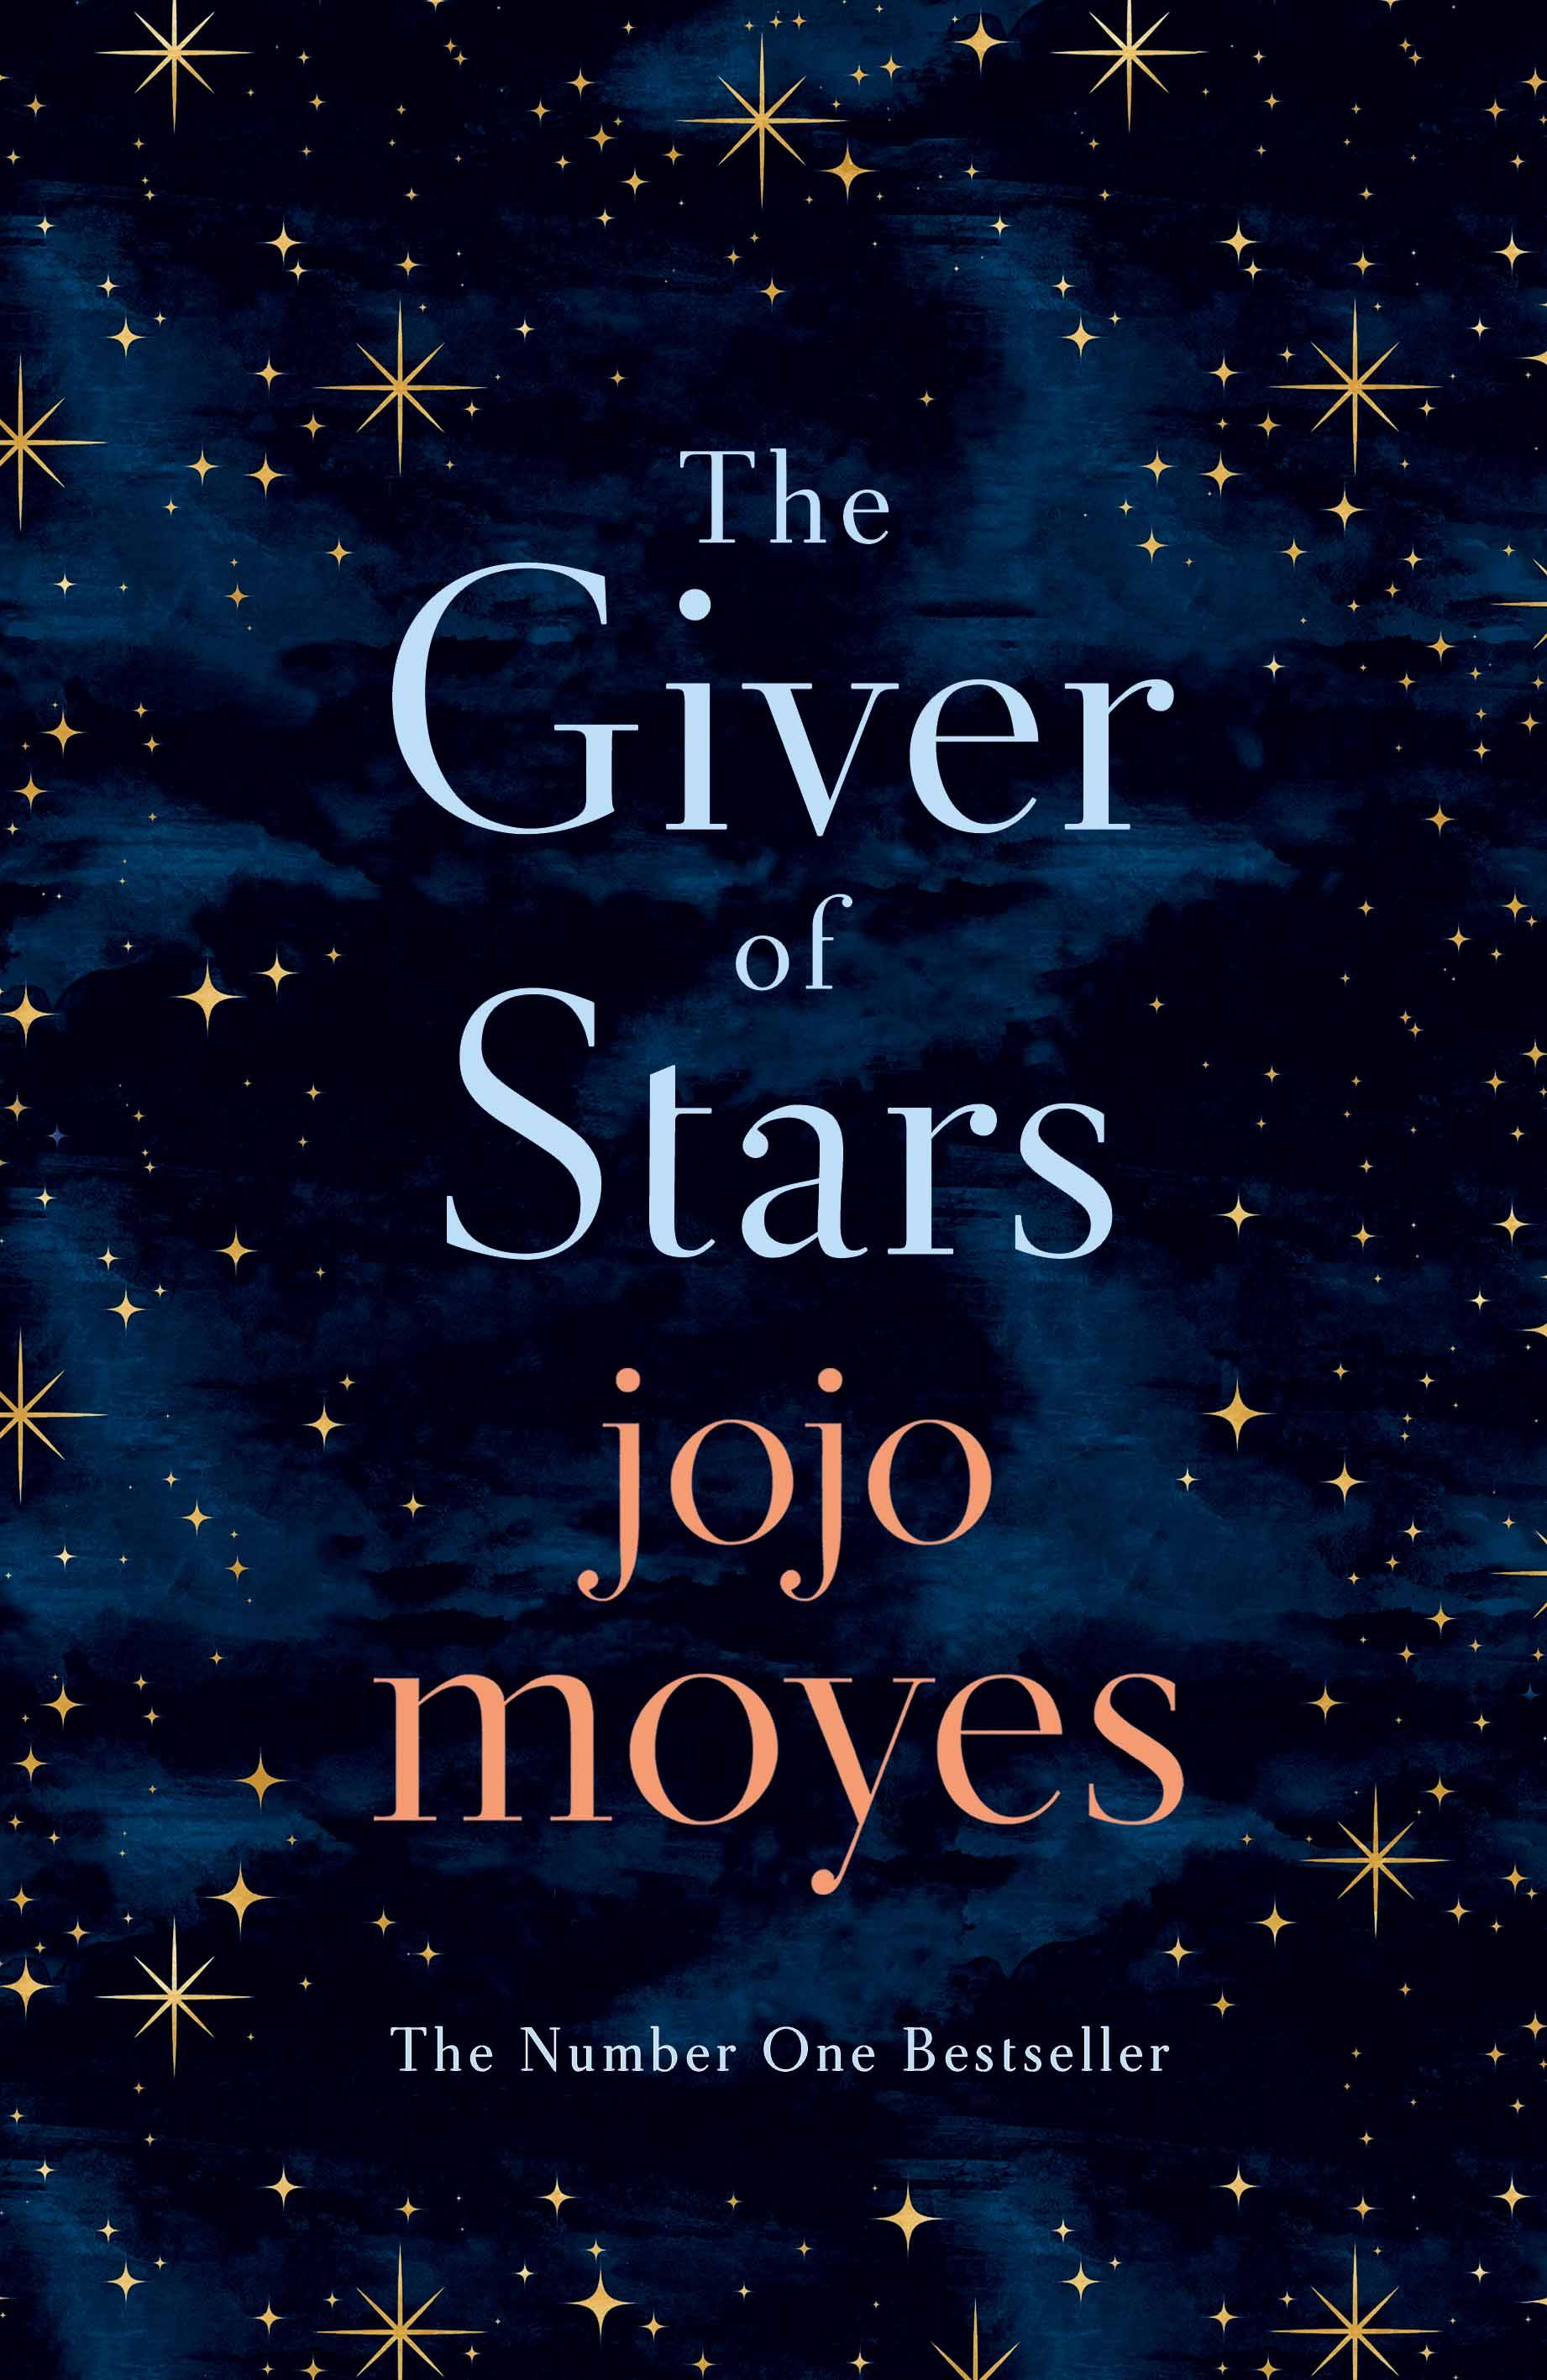 GiverofStars